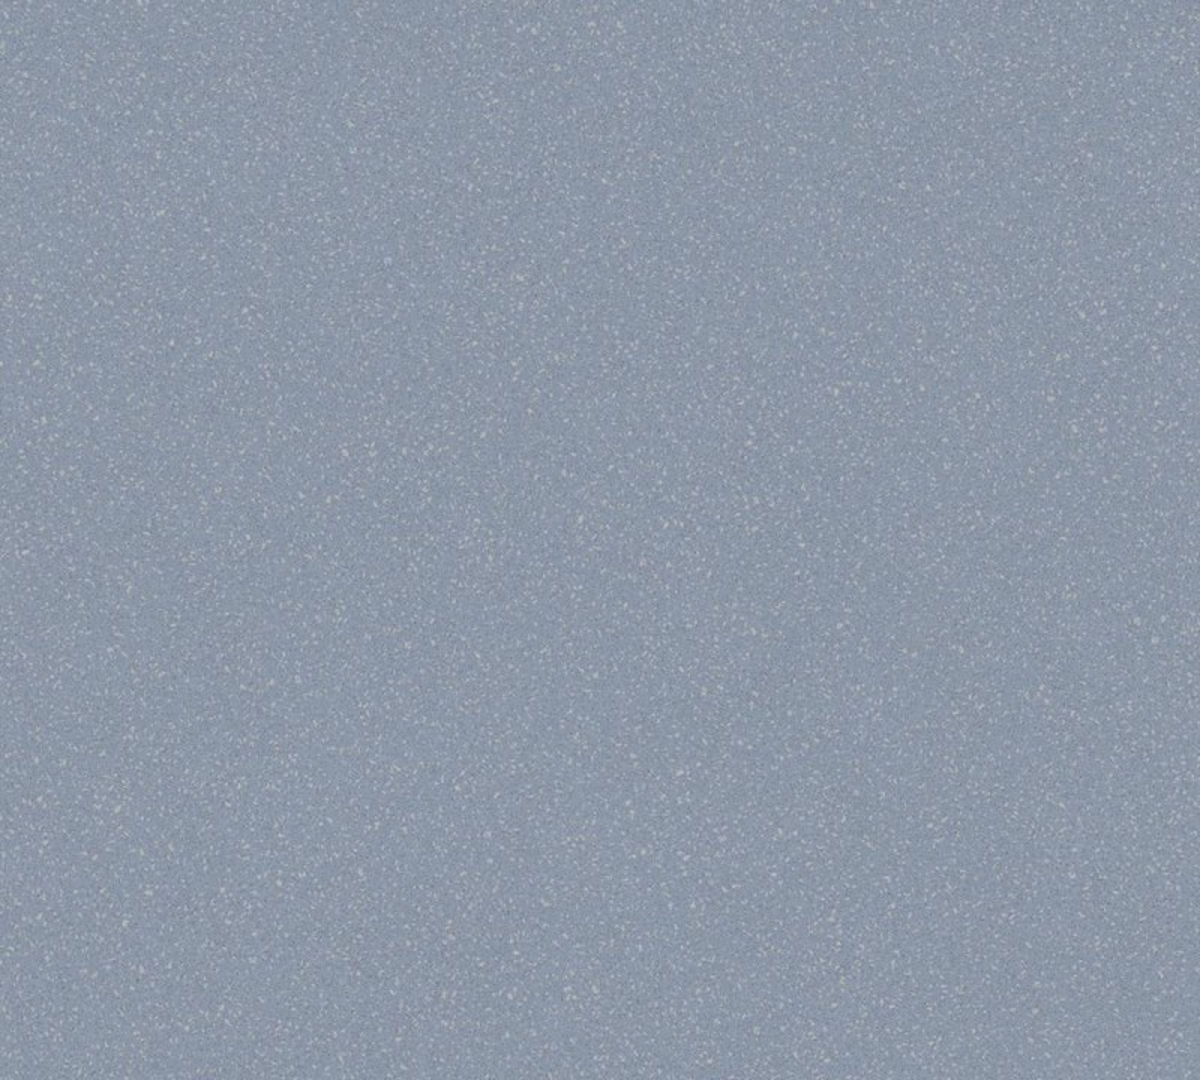 Линолеум Tarkett ACCZENT PRO Aspect 10 ACP2000702 (2 мм, 0,7 защита) шир. рул. 2;3;4м, КМ2